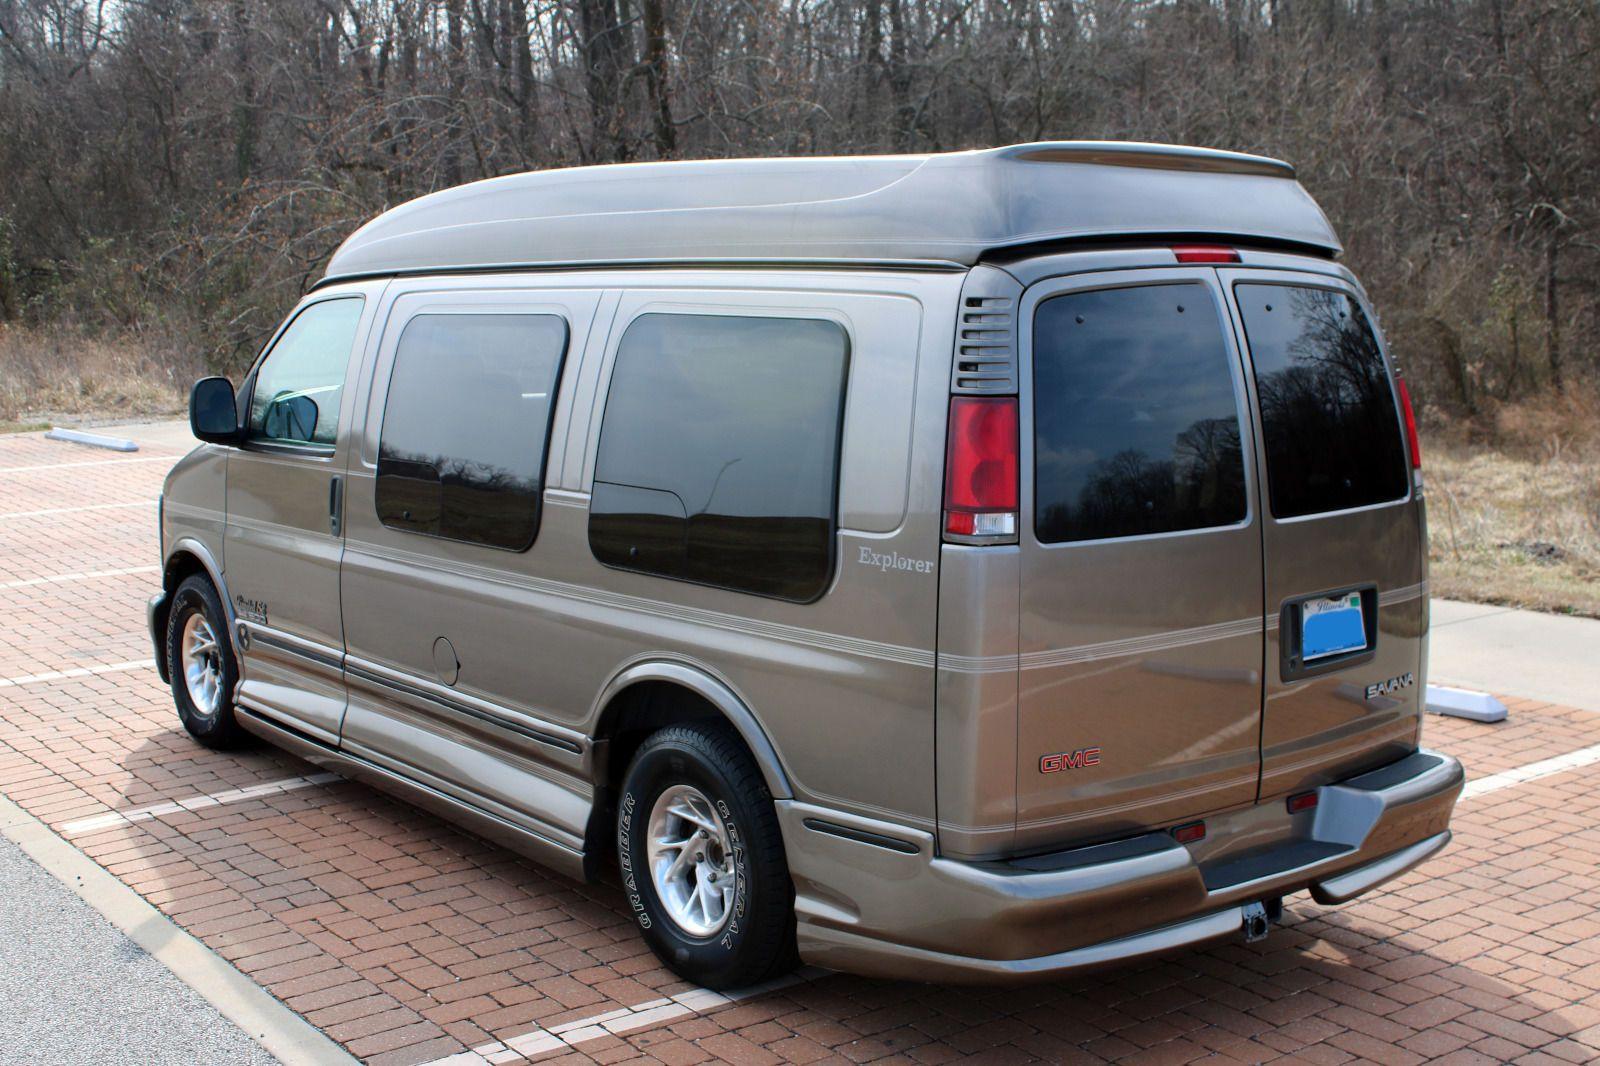 hight resolution of 2000 gmc savana explorer ebay chevrolet van chevy express custom vans gmc